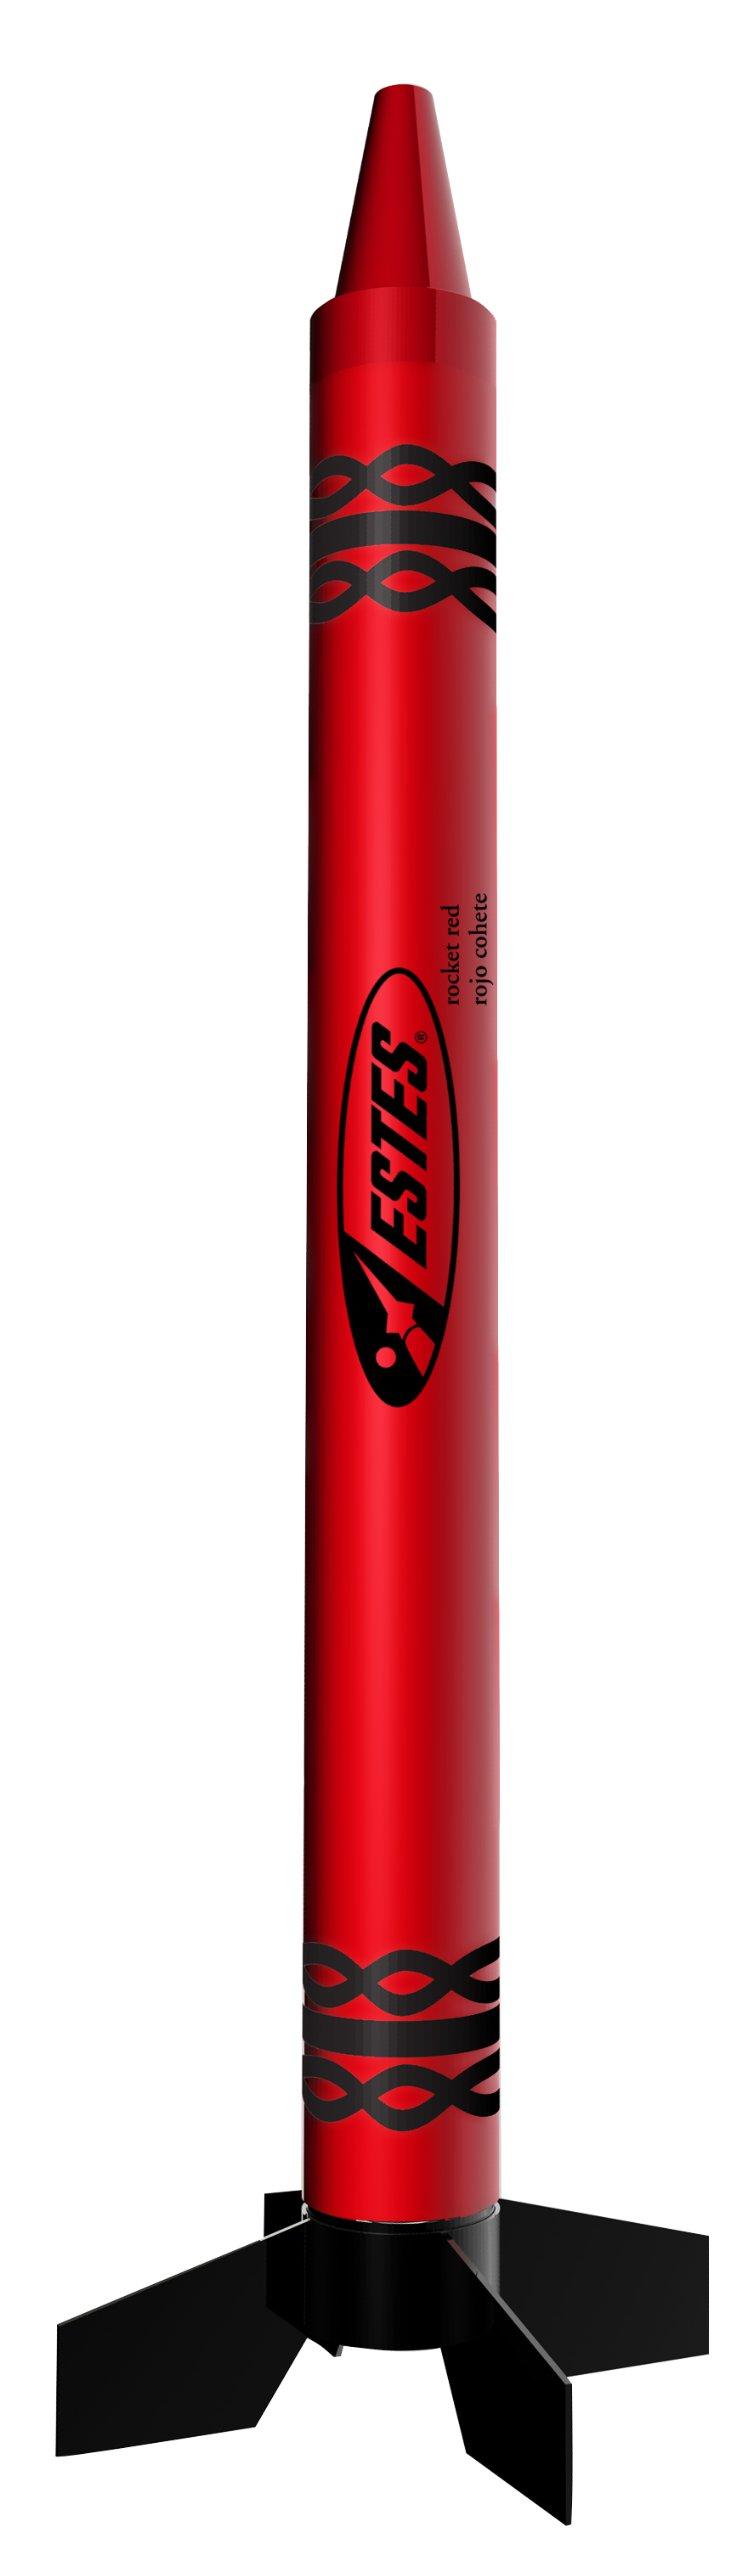 Estes Rocket Crayon Model Rocket Kit, Red